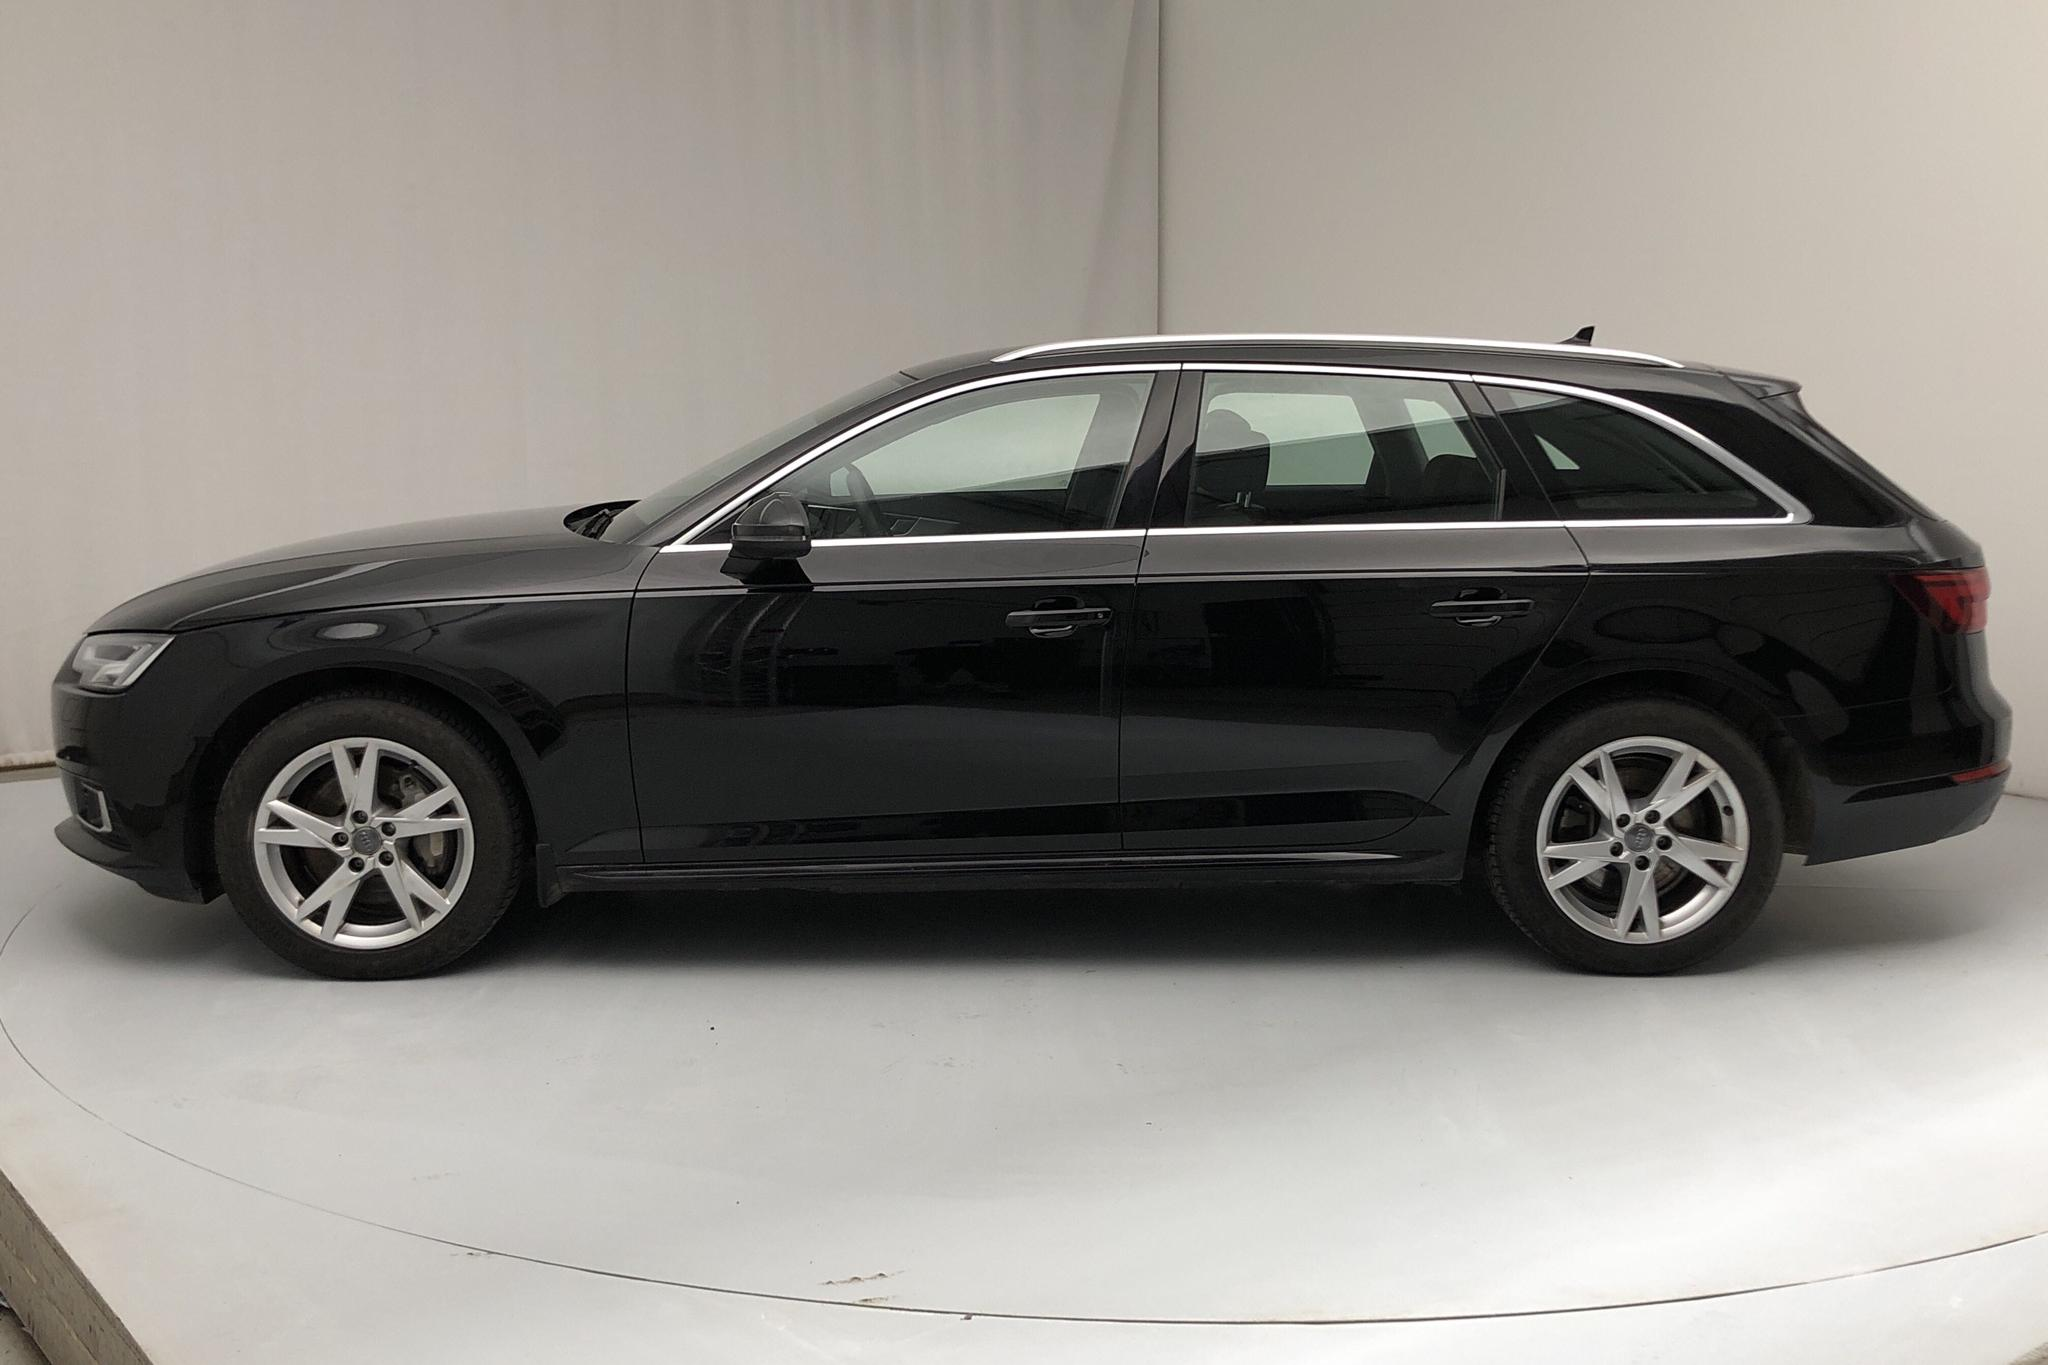 Audi A4 2.0 TDI Avant quattro (190hk) - 58 900 km - Automatic - black - 2018